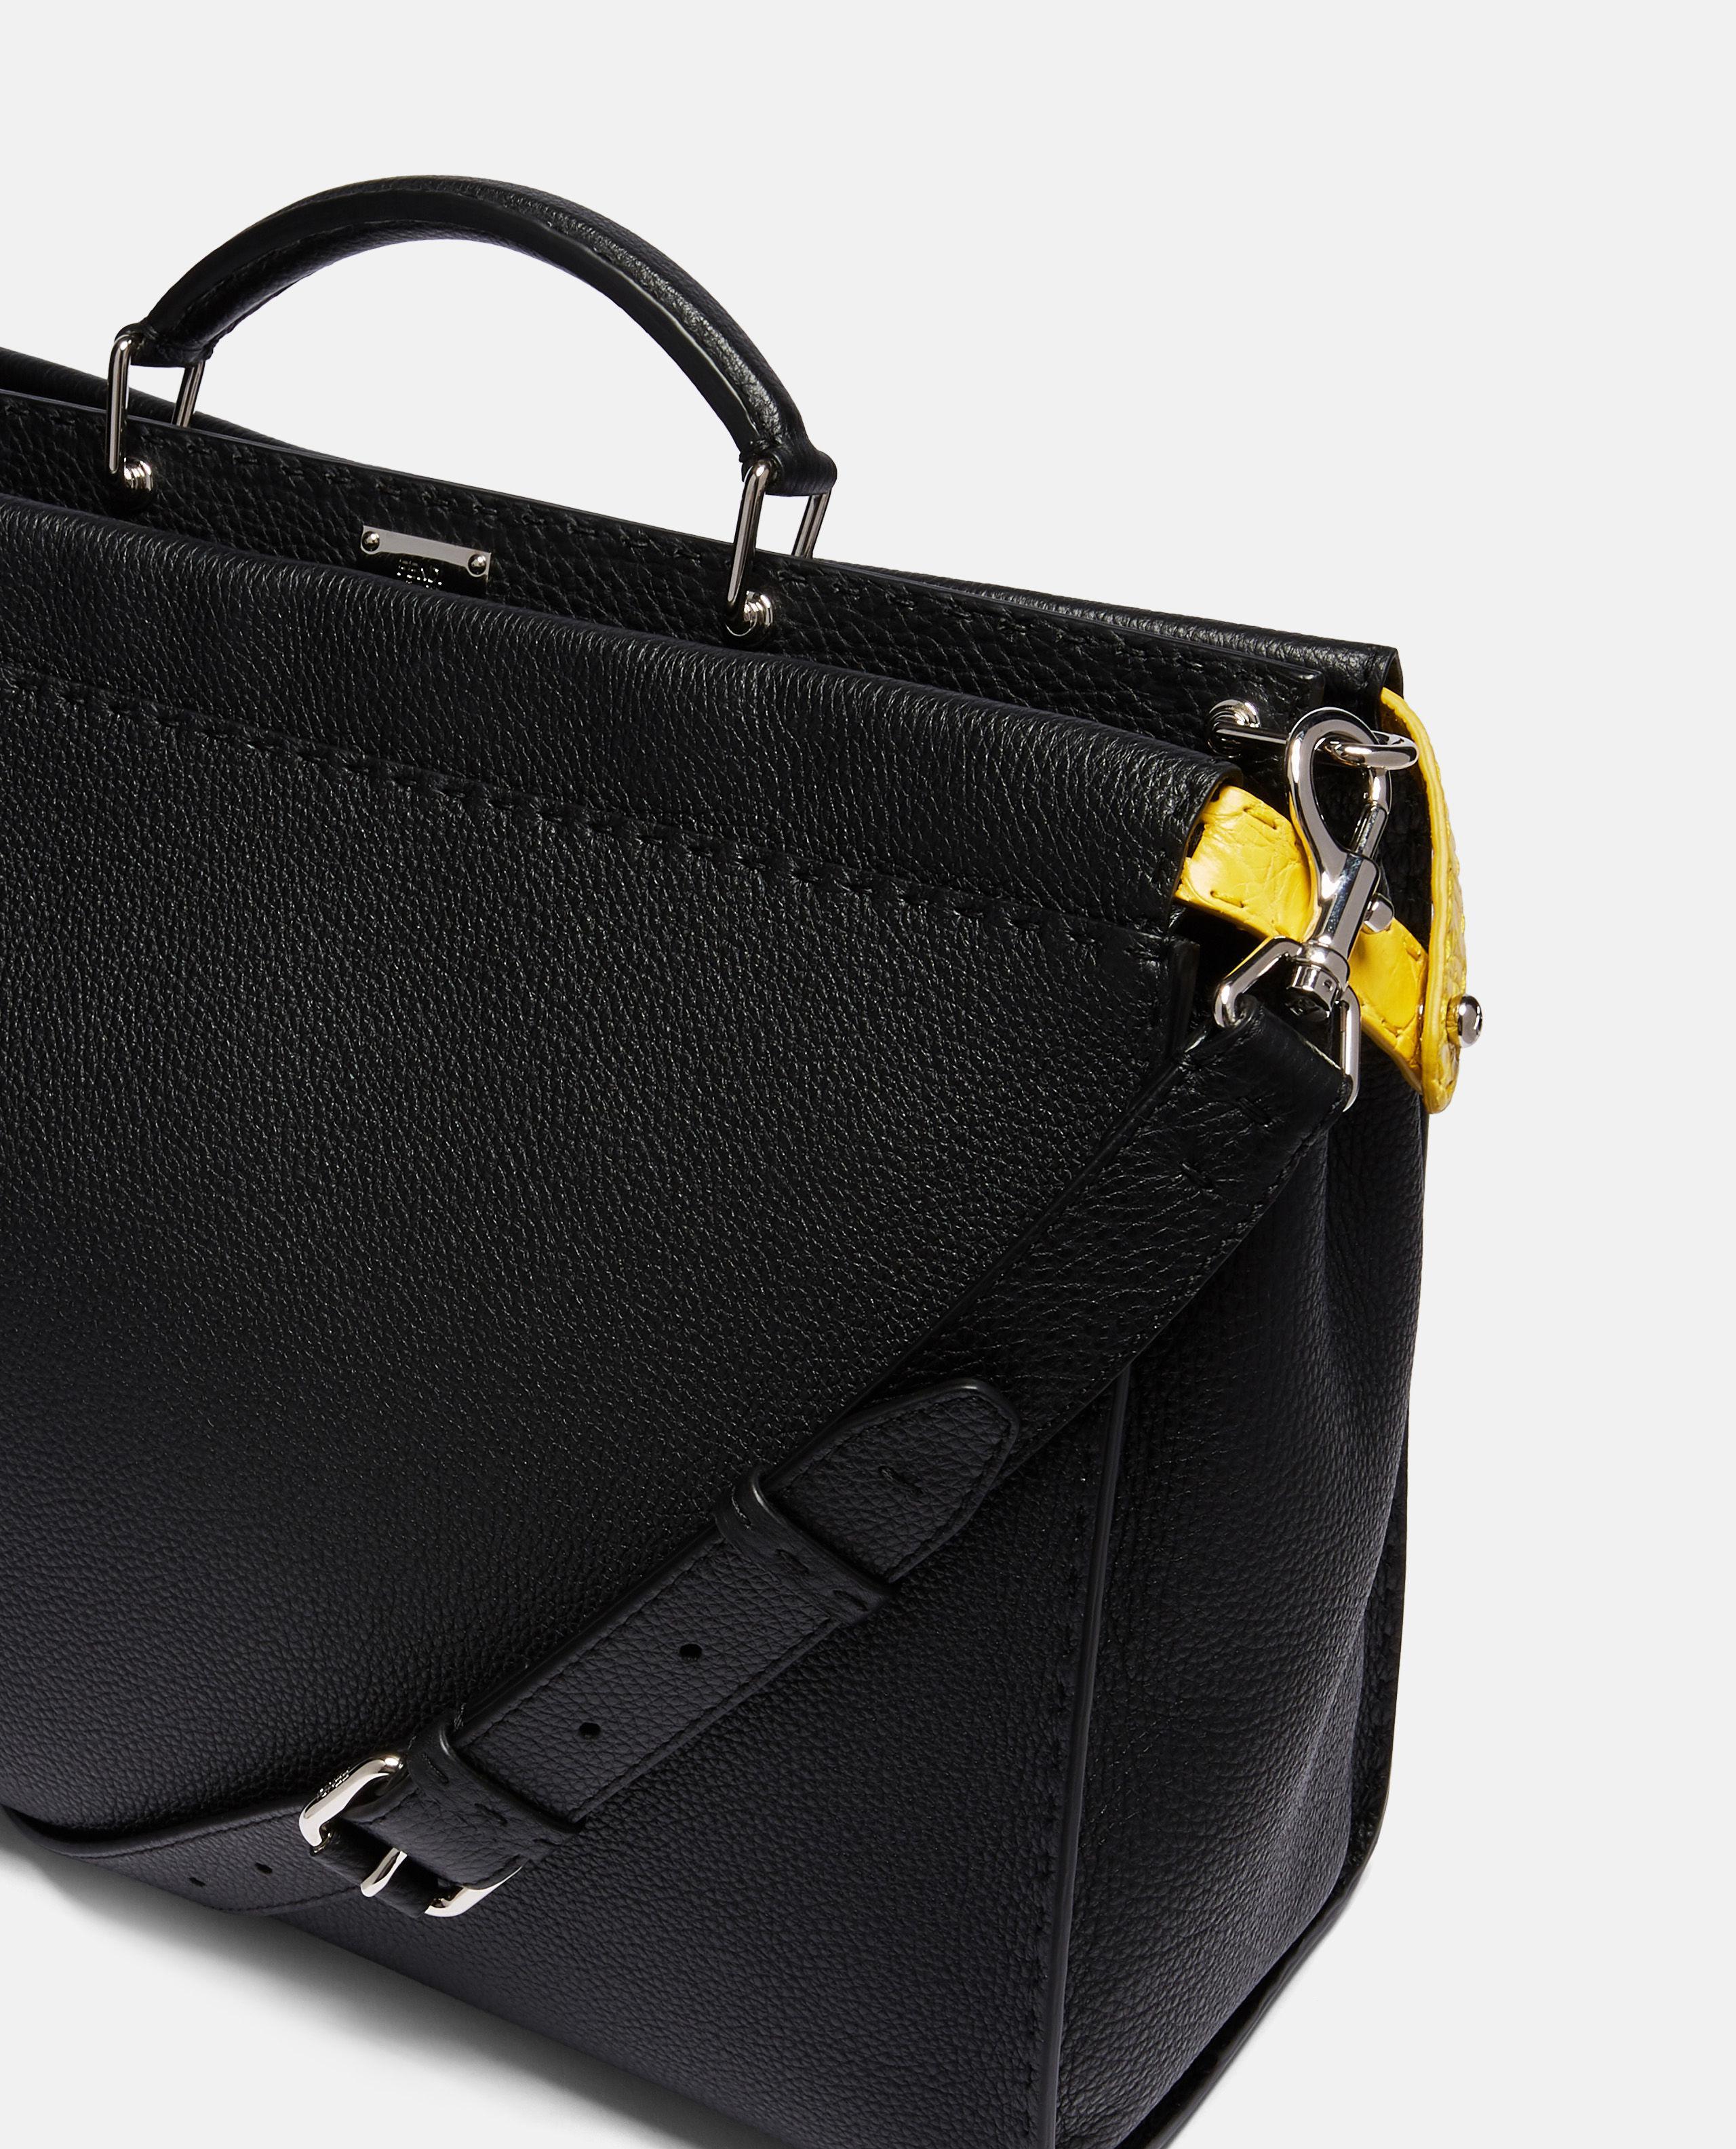 c515036d96c9 Lyst - Fendi Regular Peekaboo Bag in Black for Men